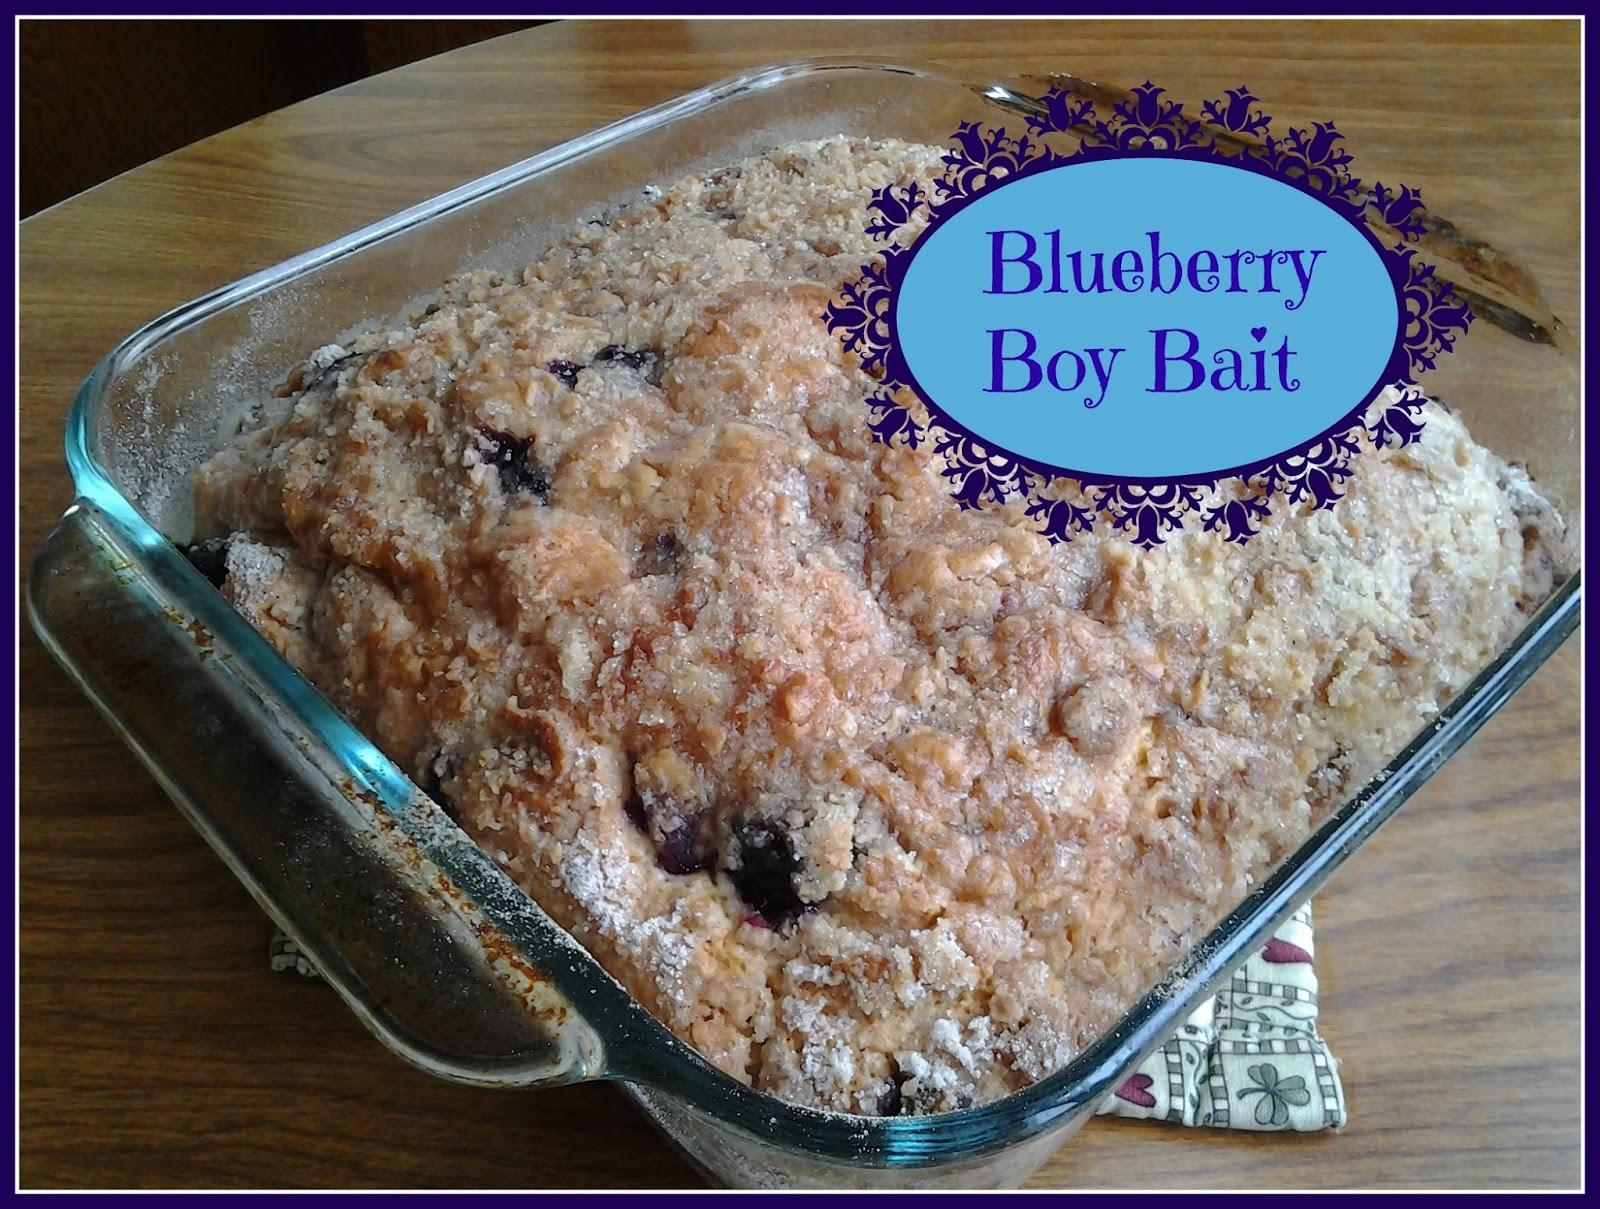 Blueberry Boy Bait